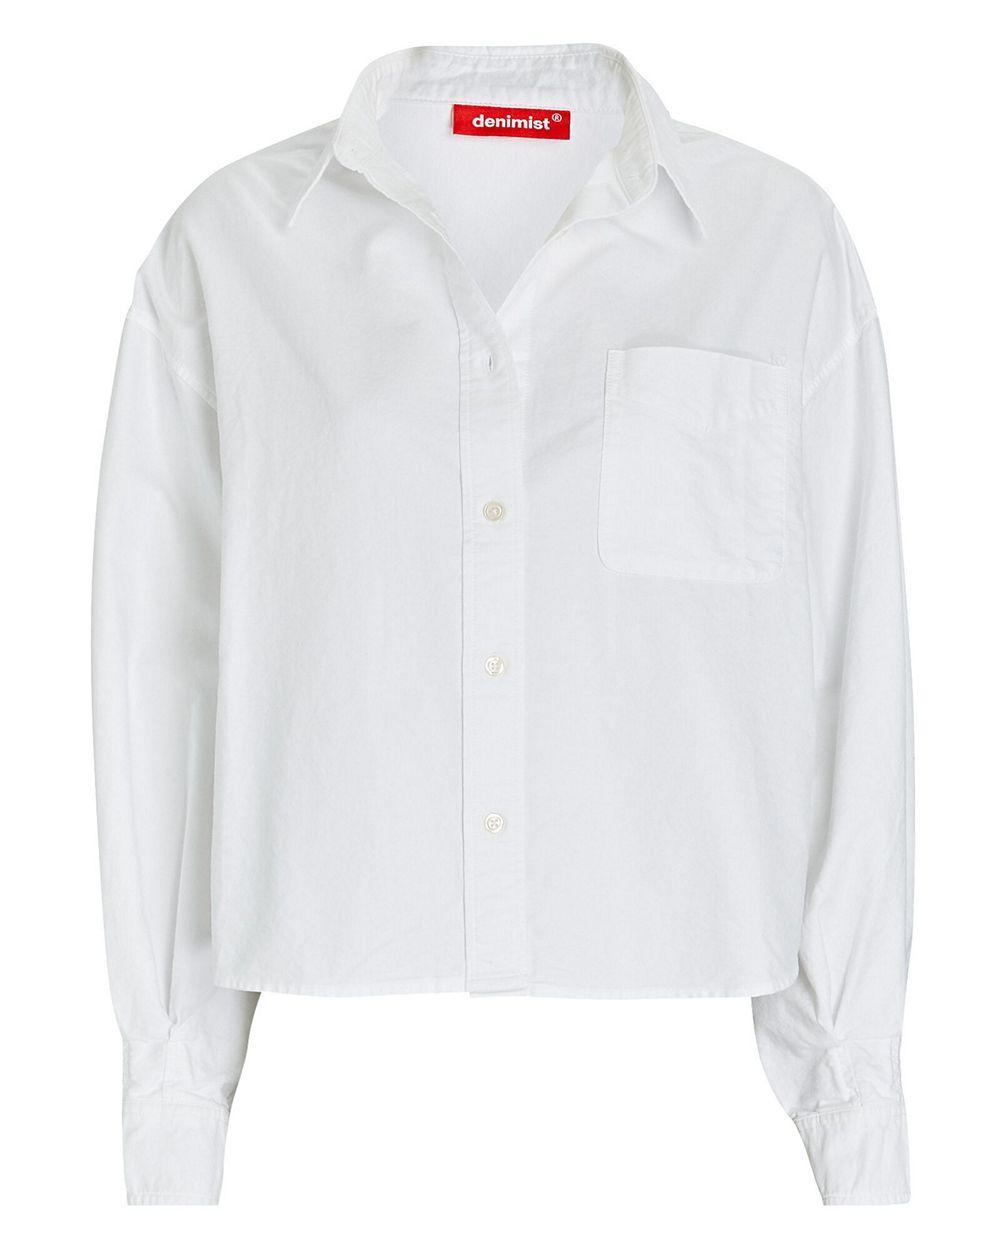 Mayfield Button Down Shirt Item # DSW4240-850A